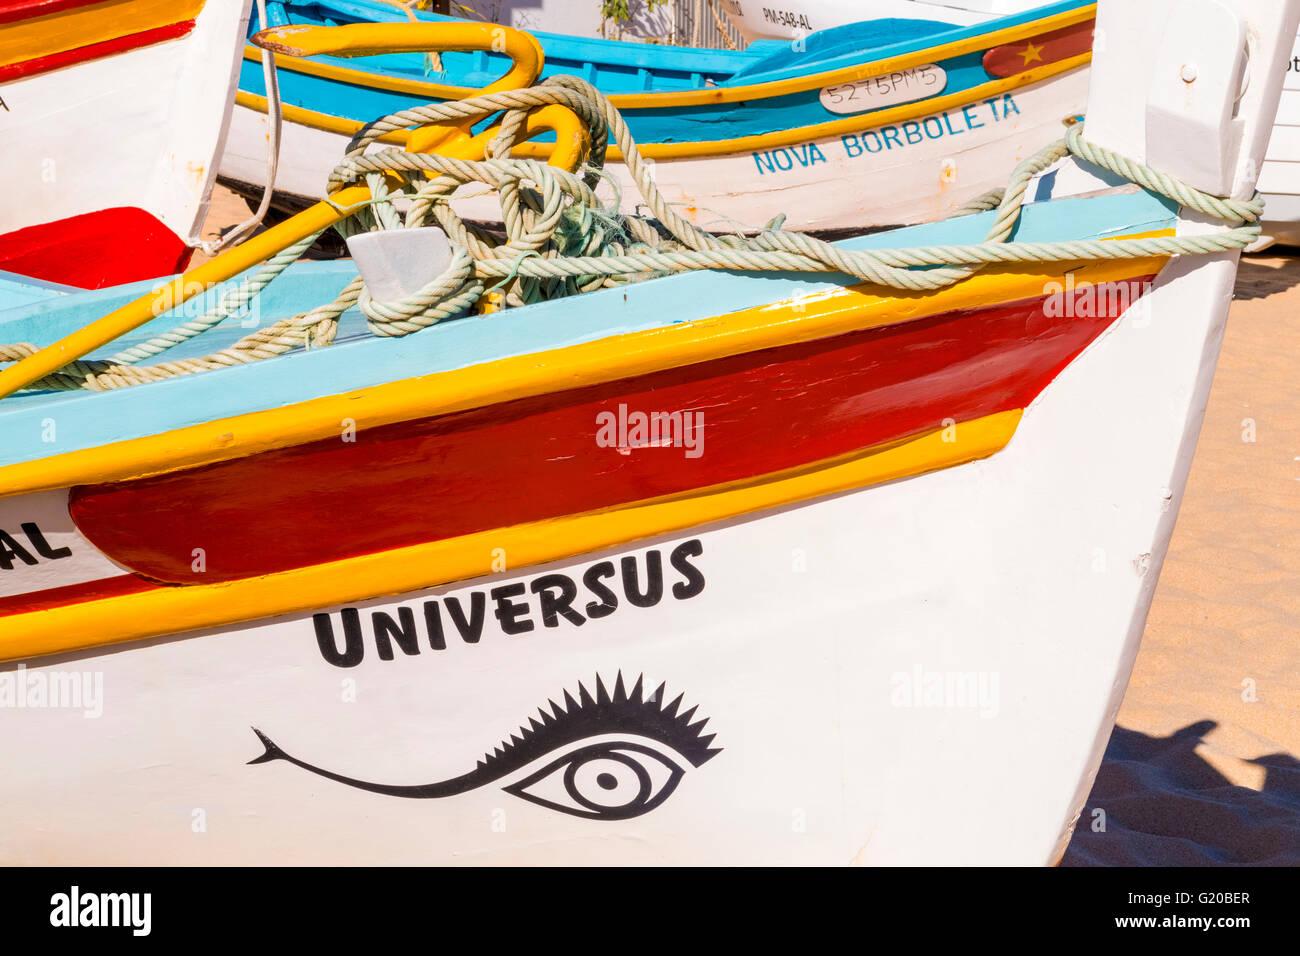 Universus fishing boat, Armação de Pêra, Portugal - Stock Image